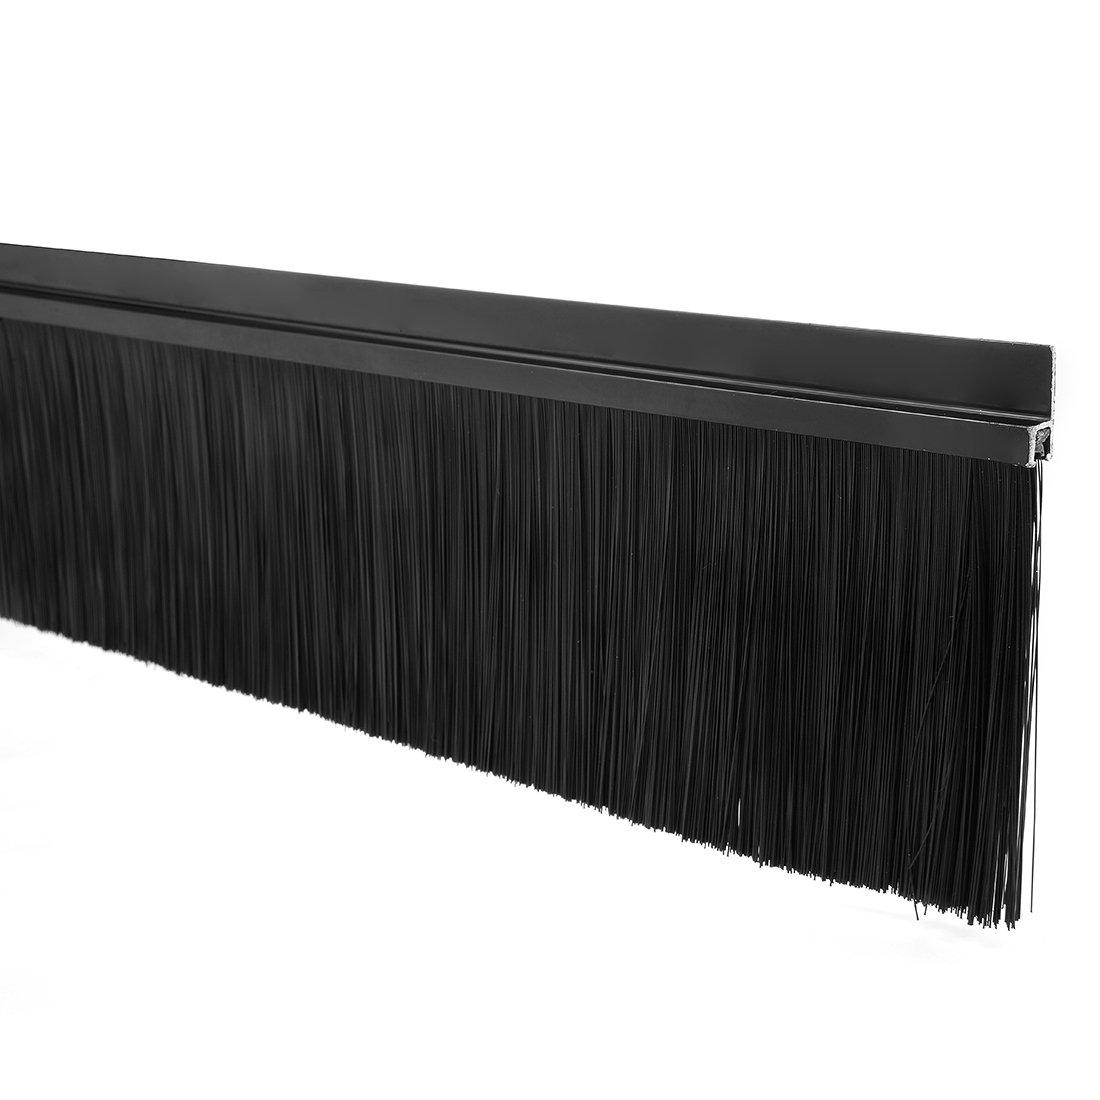 Uxcell a17060200ux0401 Door Bottom Sweep H-Shape Aluminum Alloy Base Nylon Brush